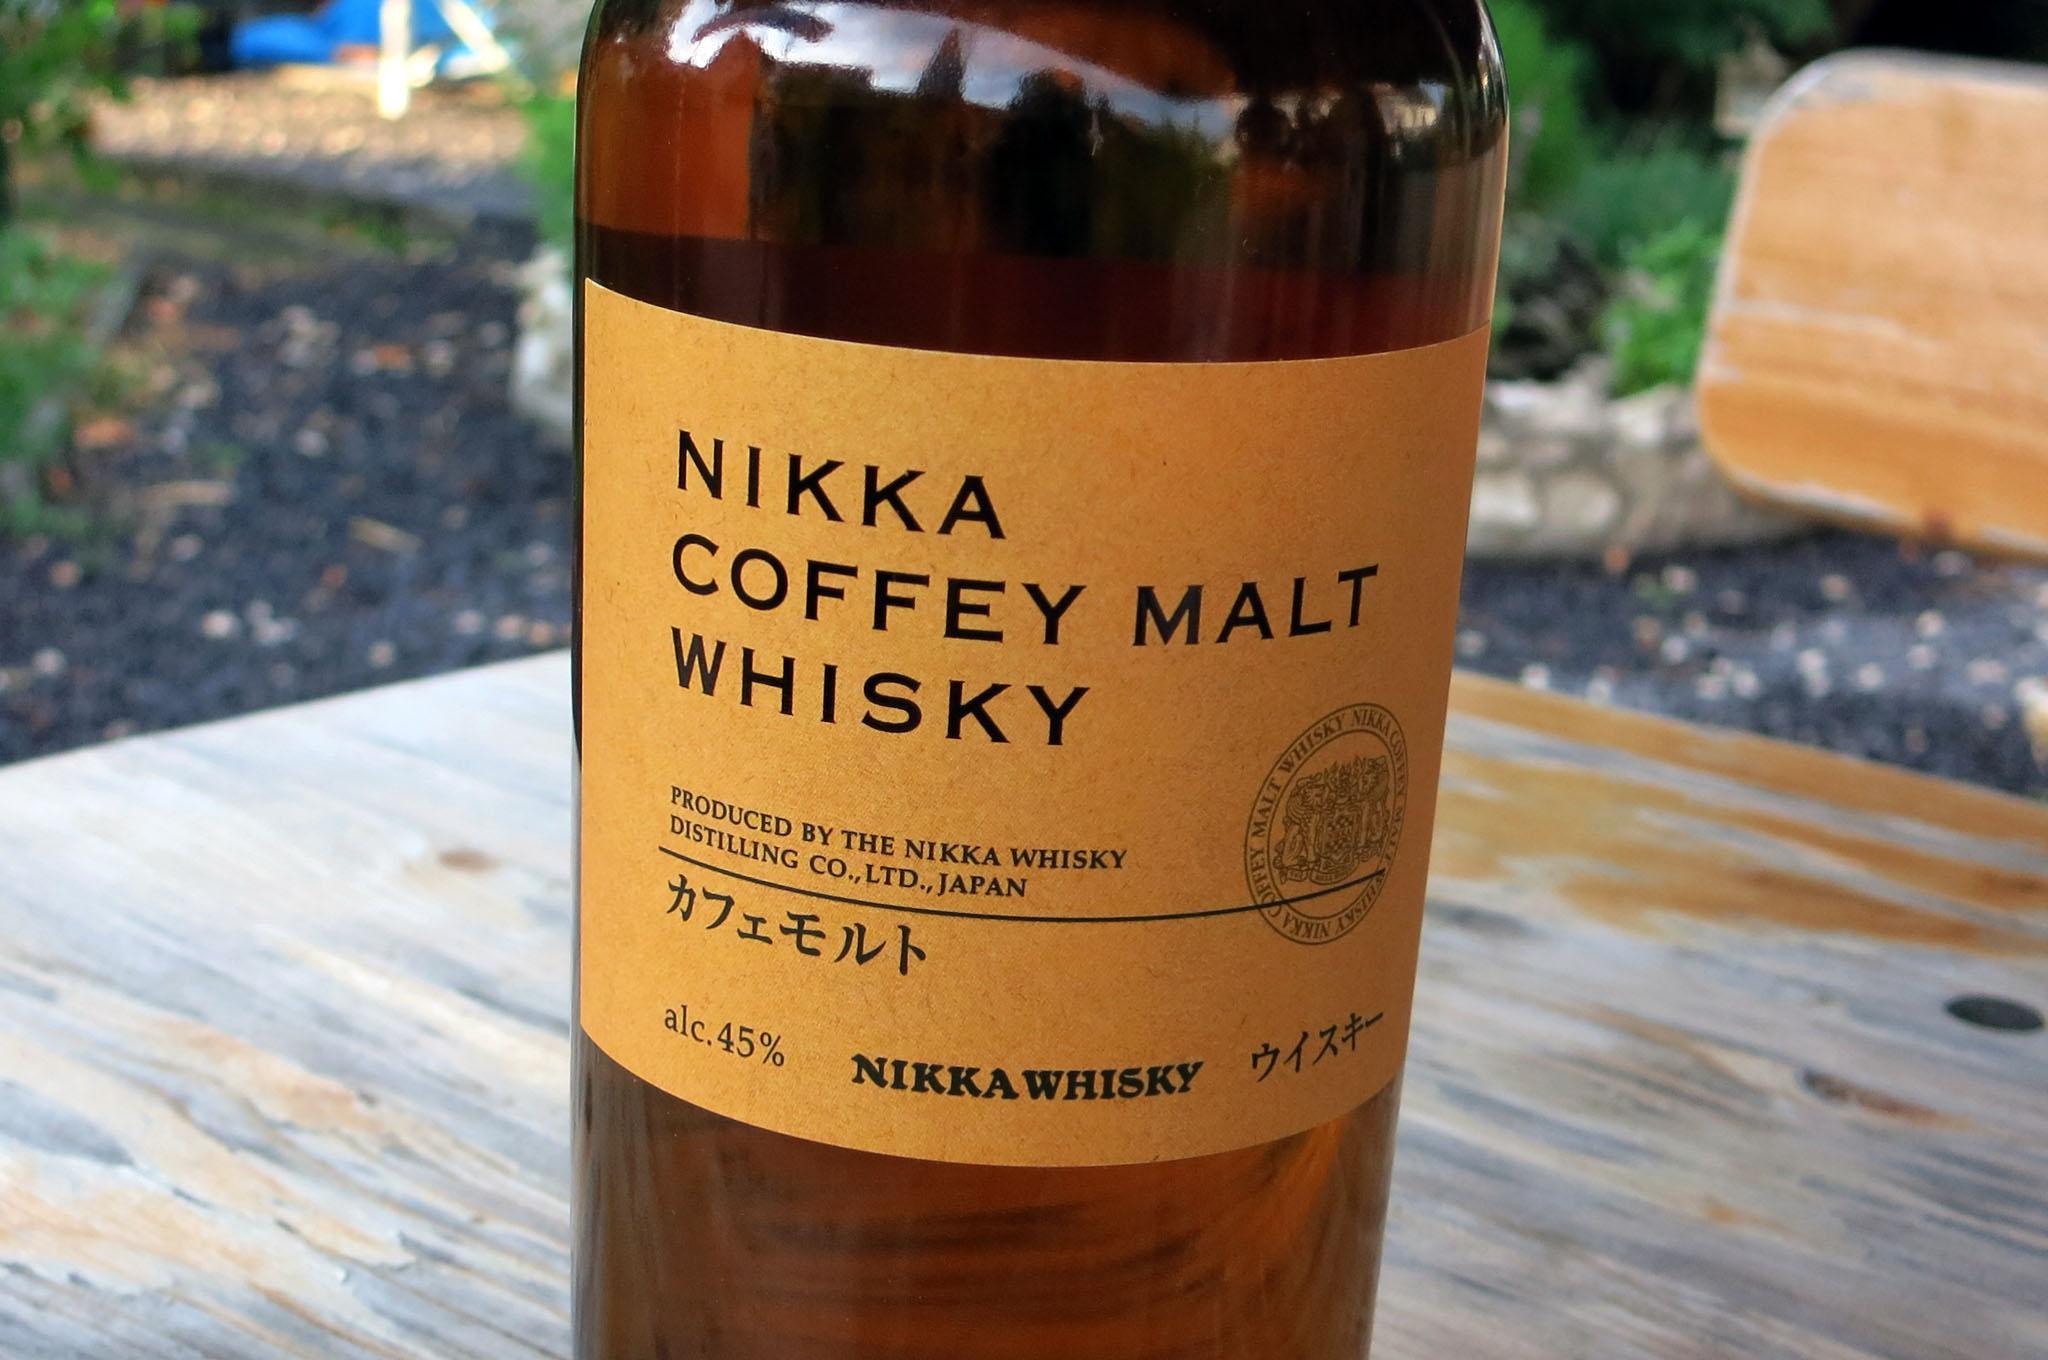 Nikky Coffey Malt